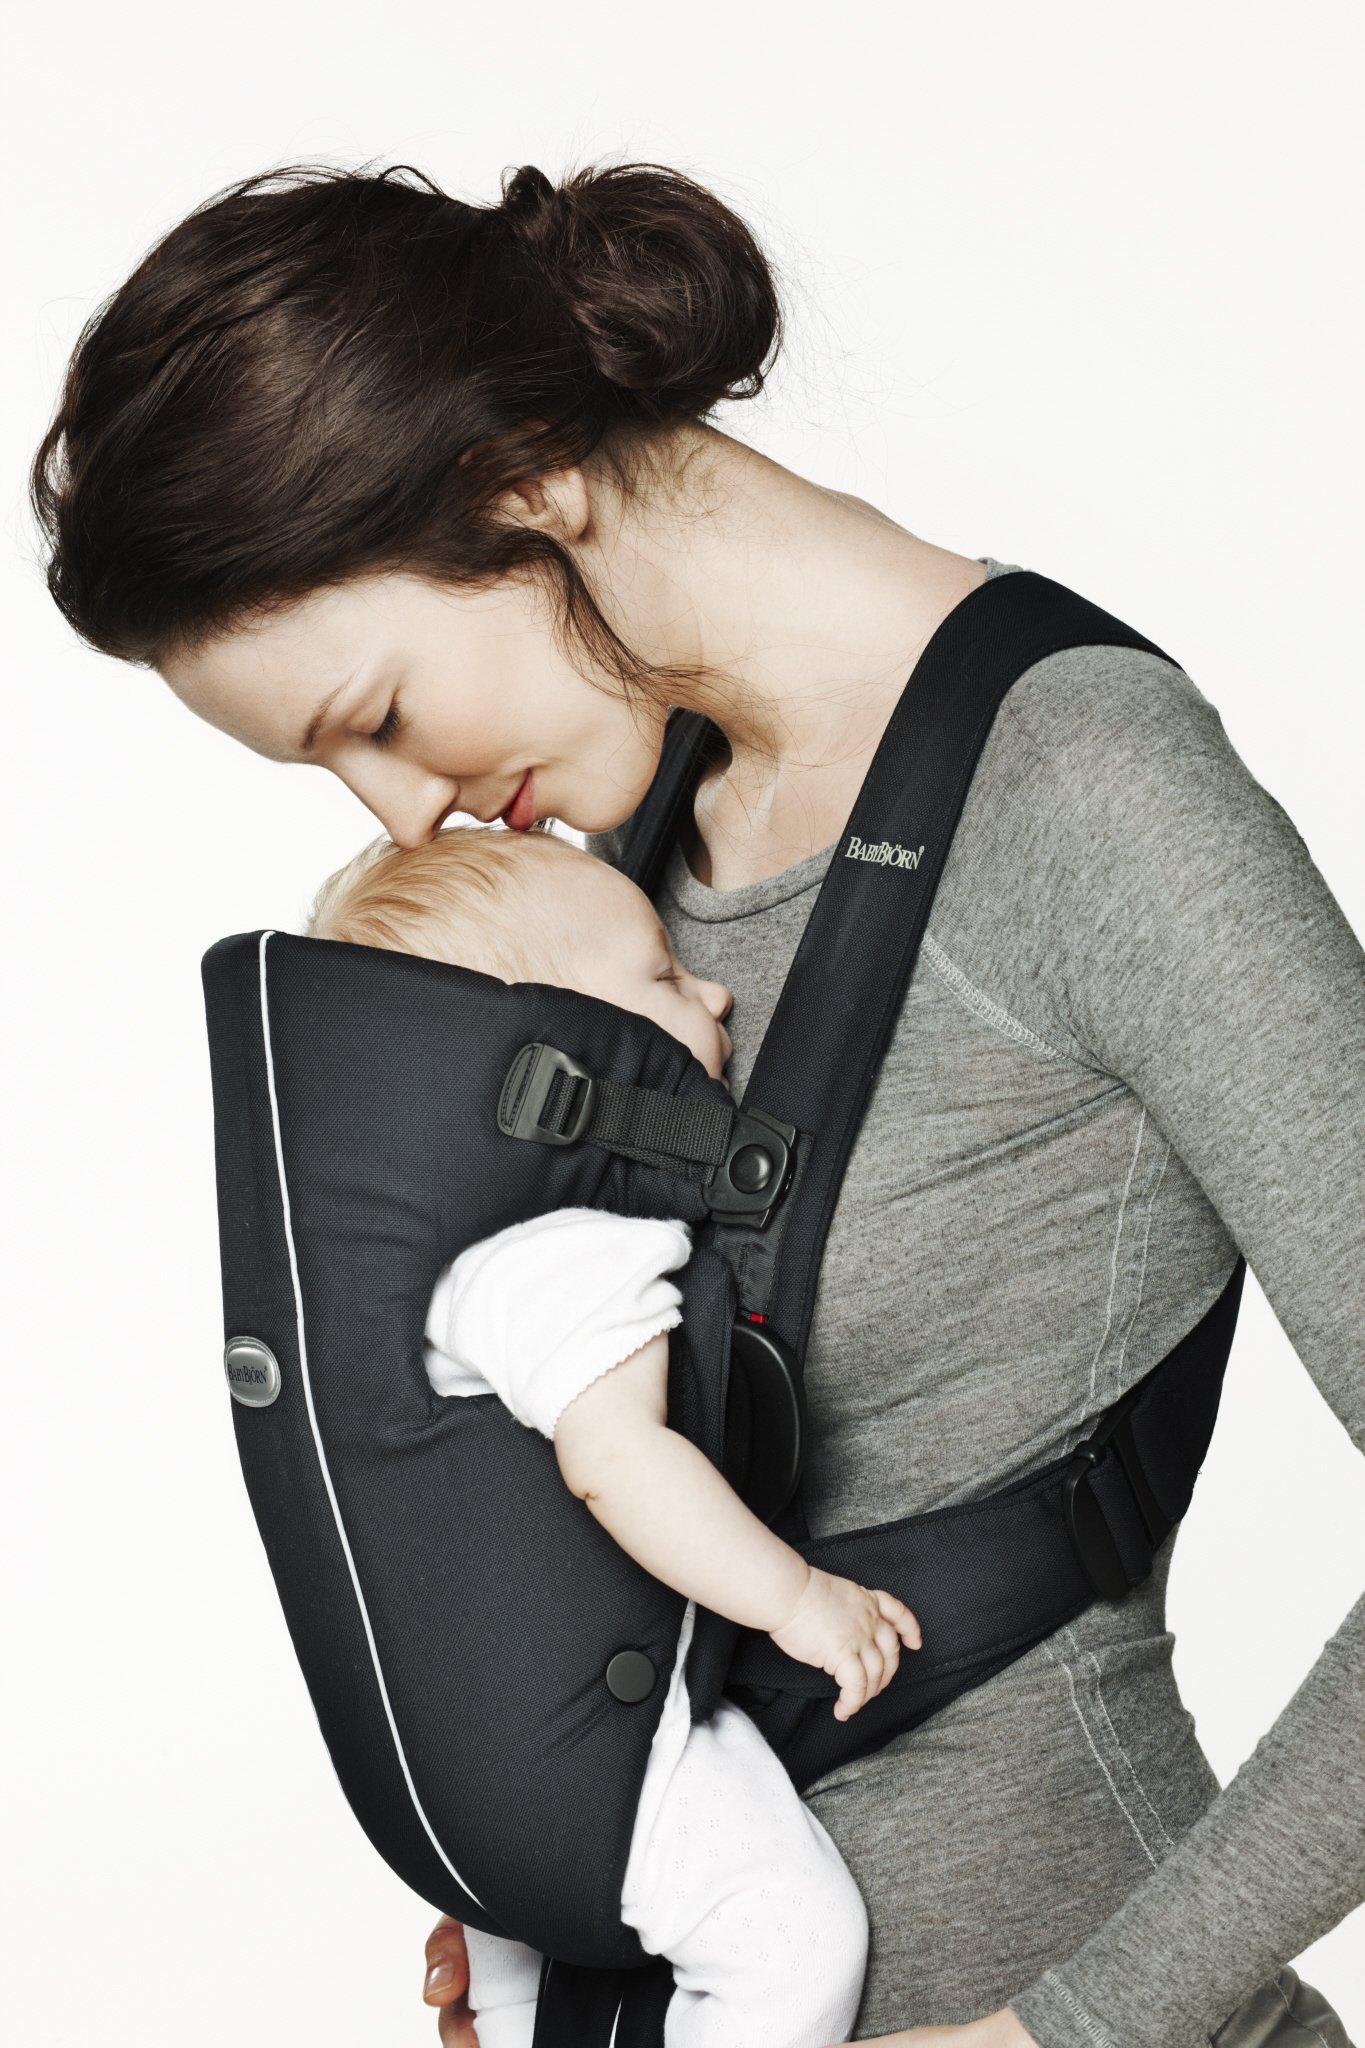 BABYBJORN Baby Carrier Original - Black, Cotton by BabyBjörn (Image #4)